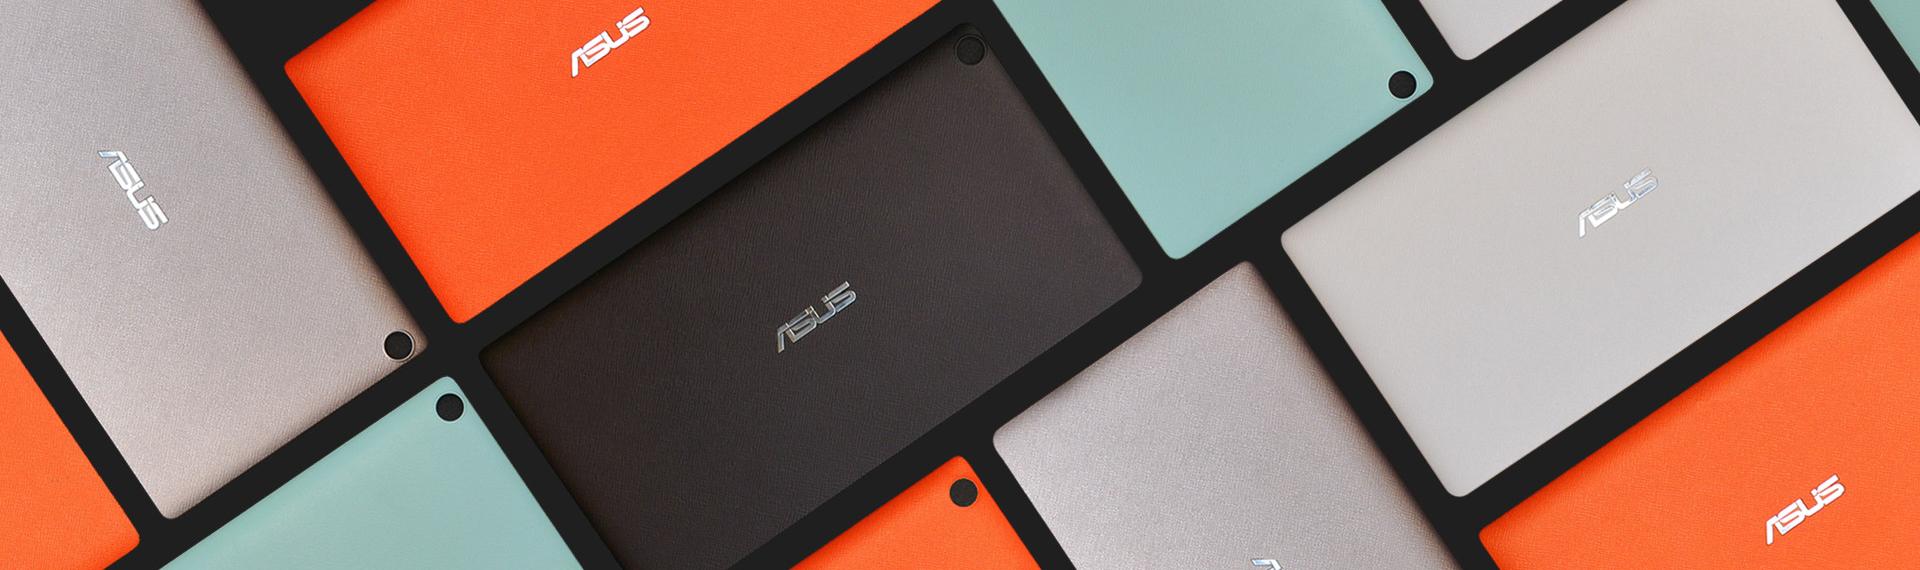 ASUS ZenPad 7 0 (Z370CG) | Tablets | ASUS Global